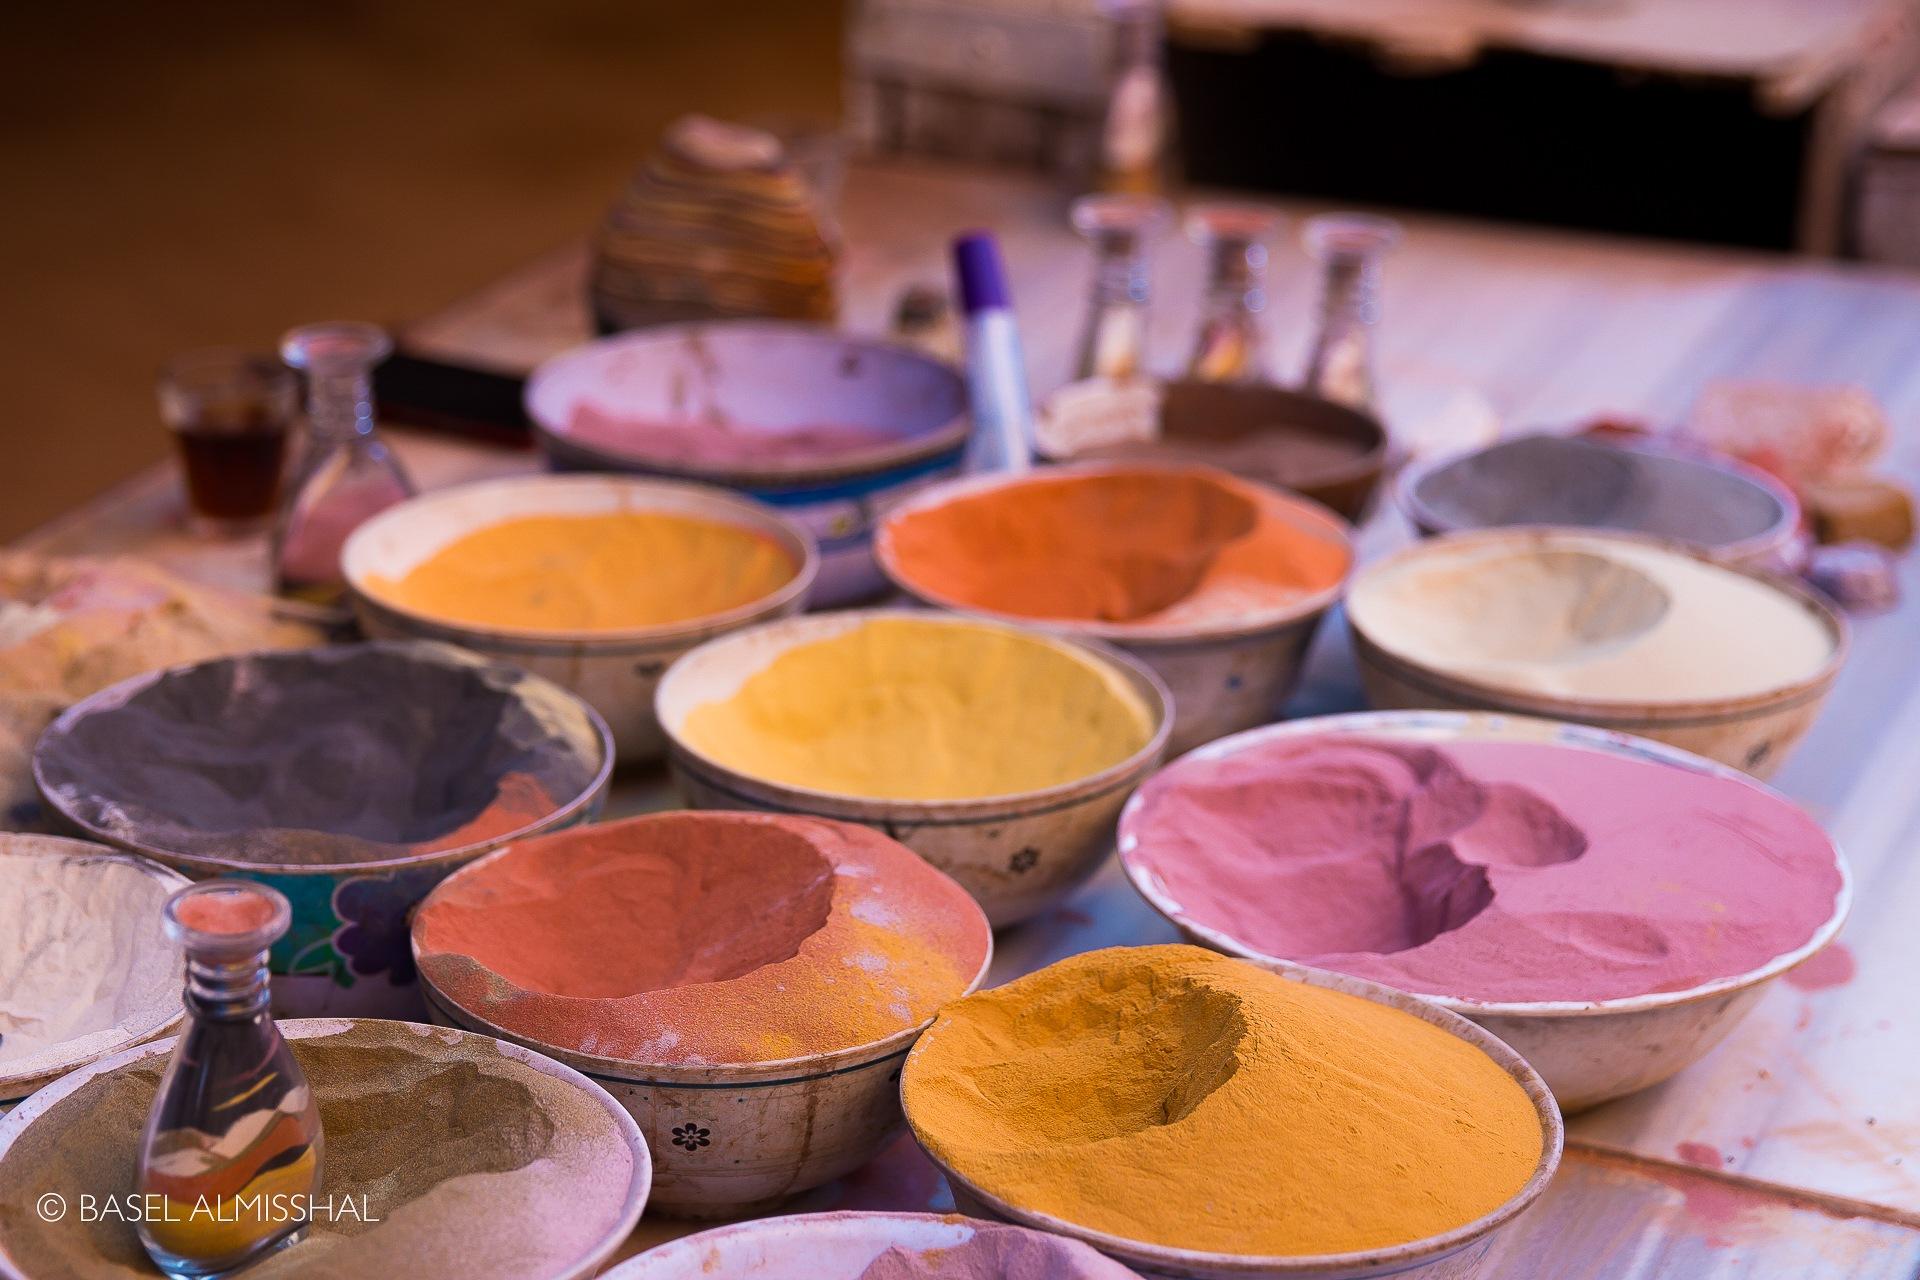 Colorful Sand Art  by Basel Almisshal